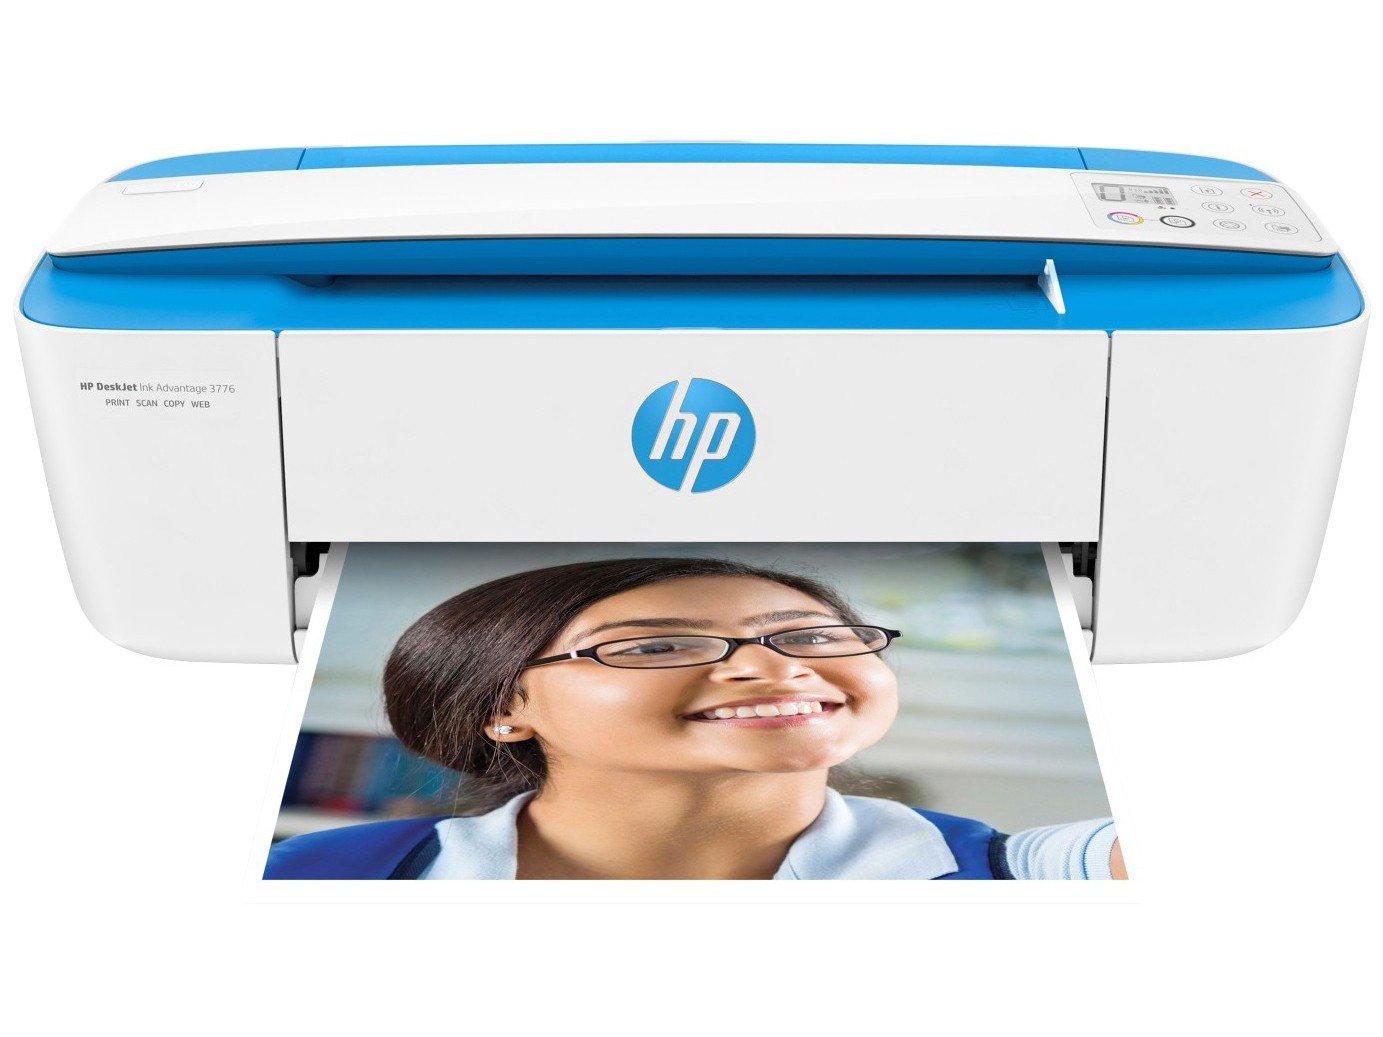 Foto 1 - Multifuncional HP DeskJet Ink Advantage 3776 - Jato de Tinta Display LCD Wi-Fi